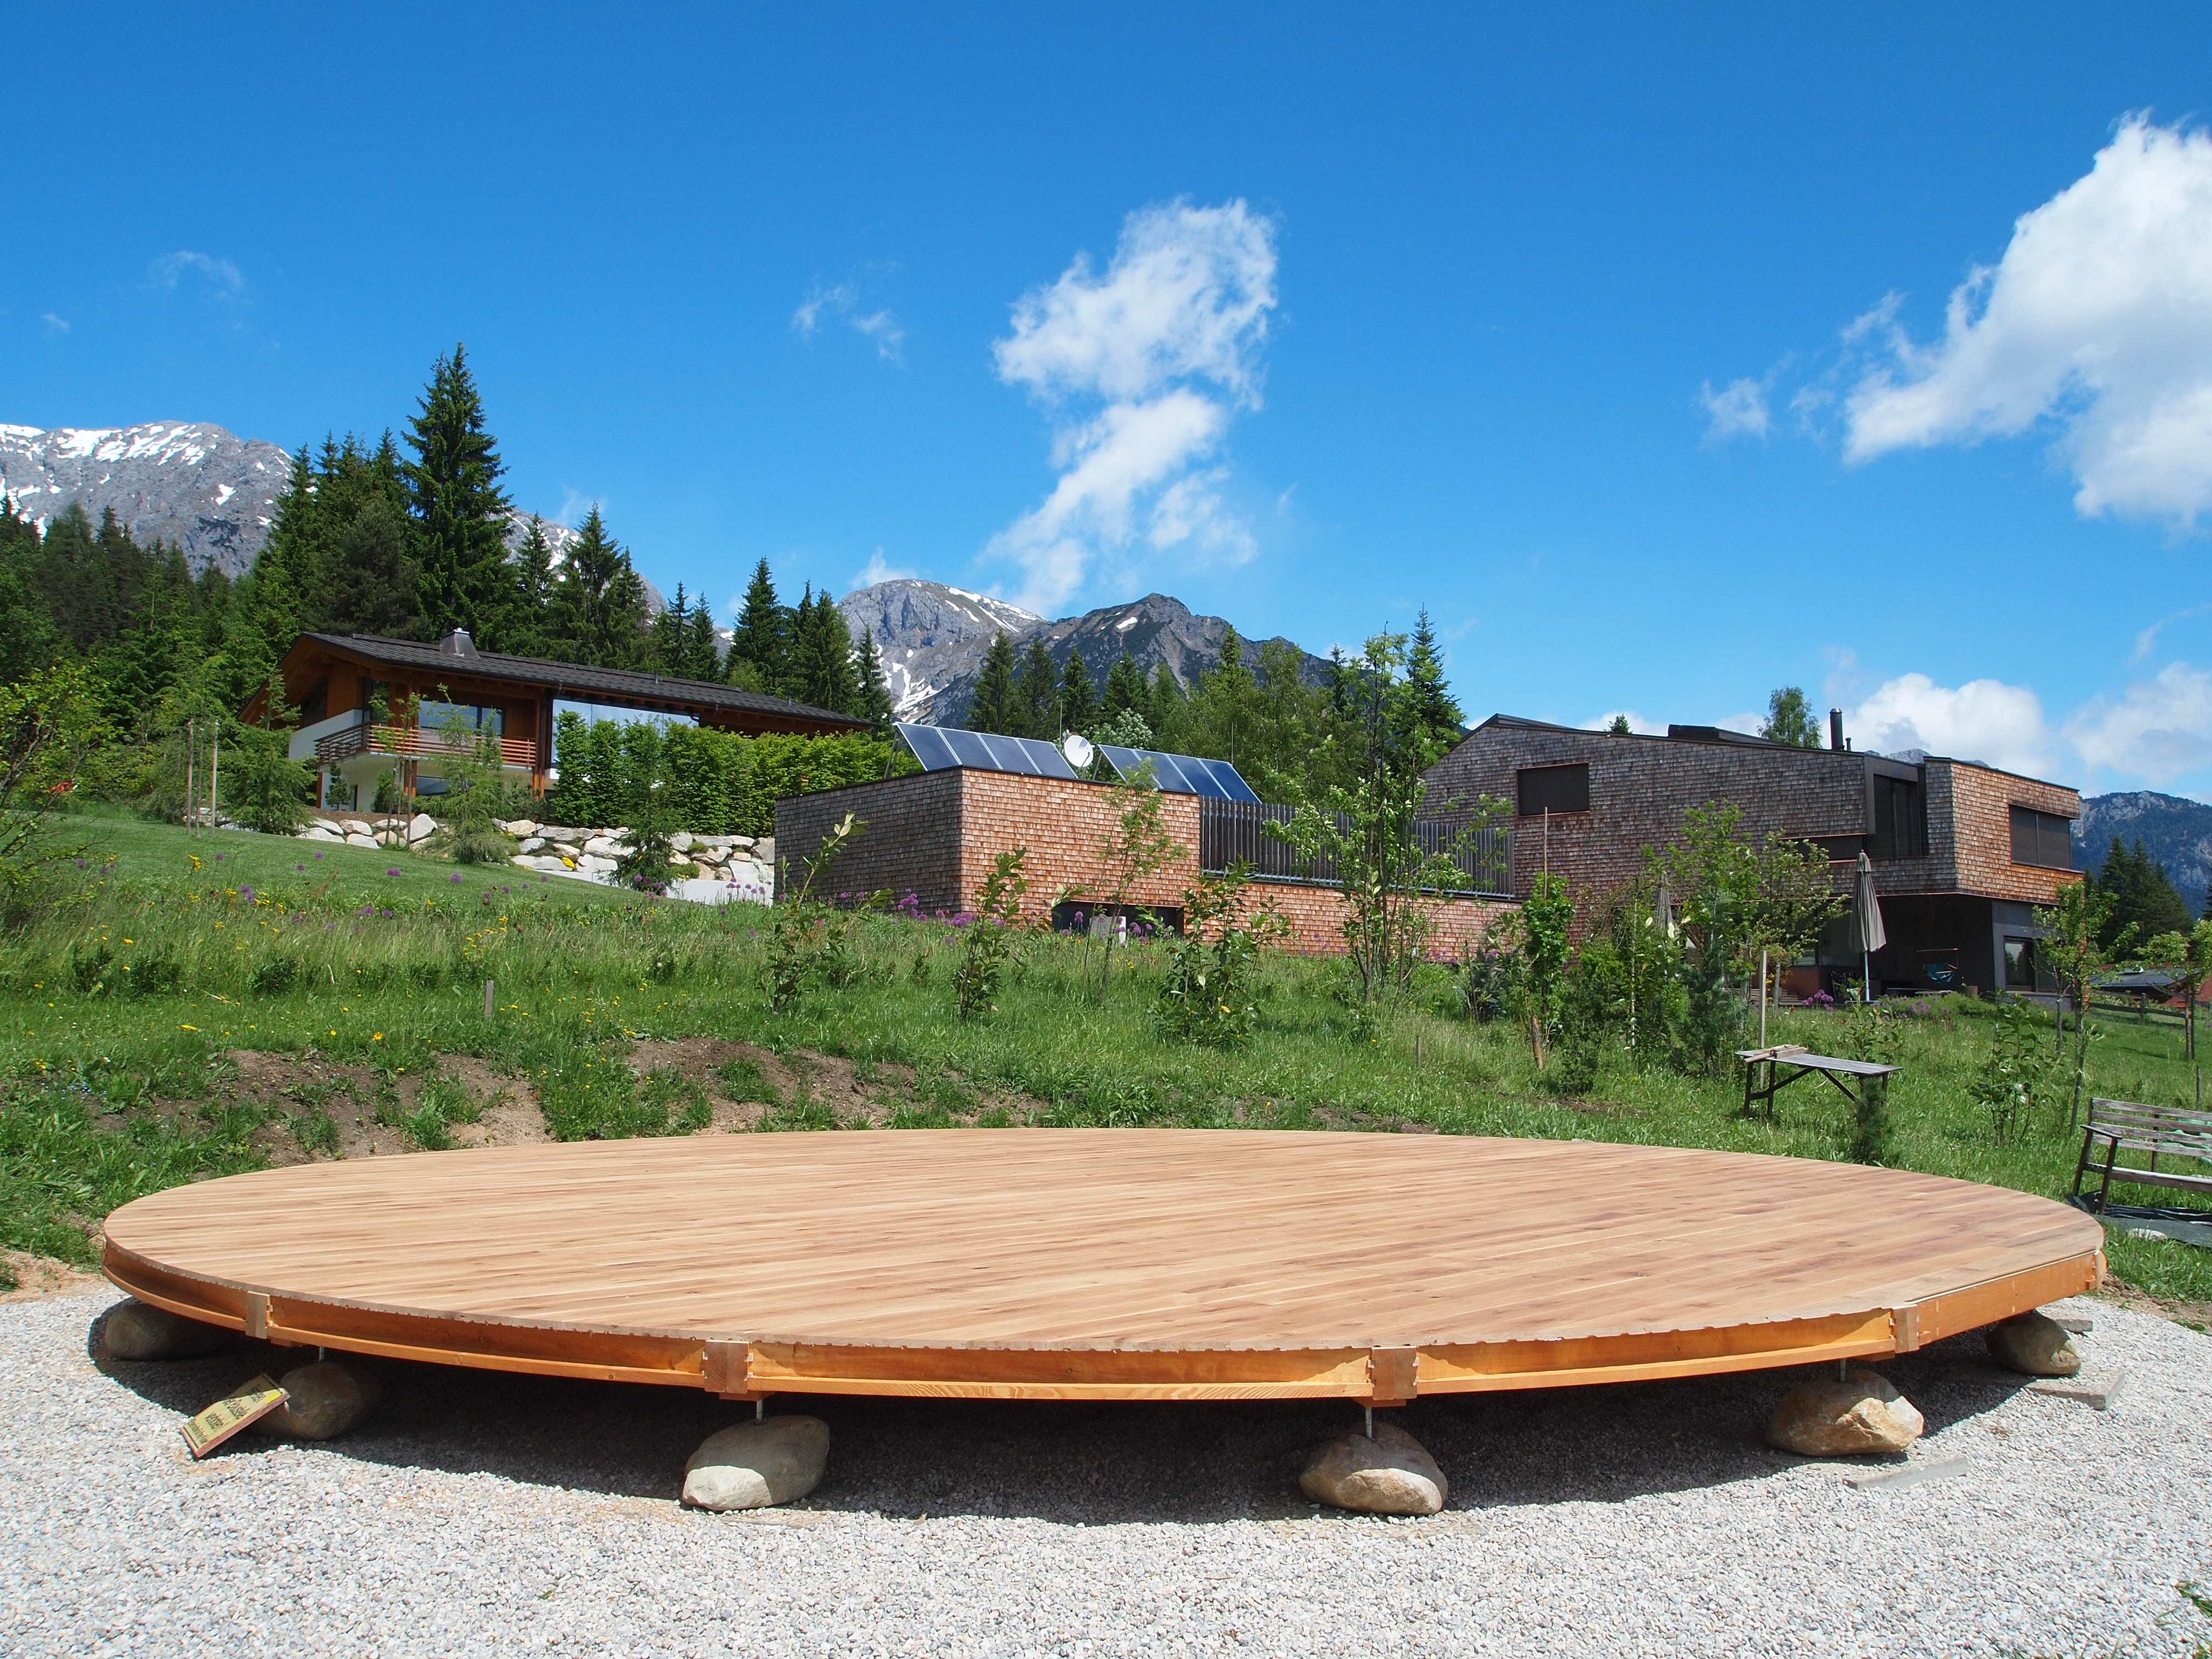 800cm platform - Austria